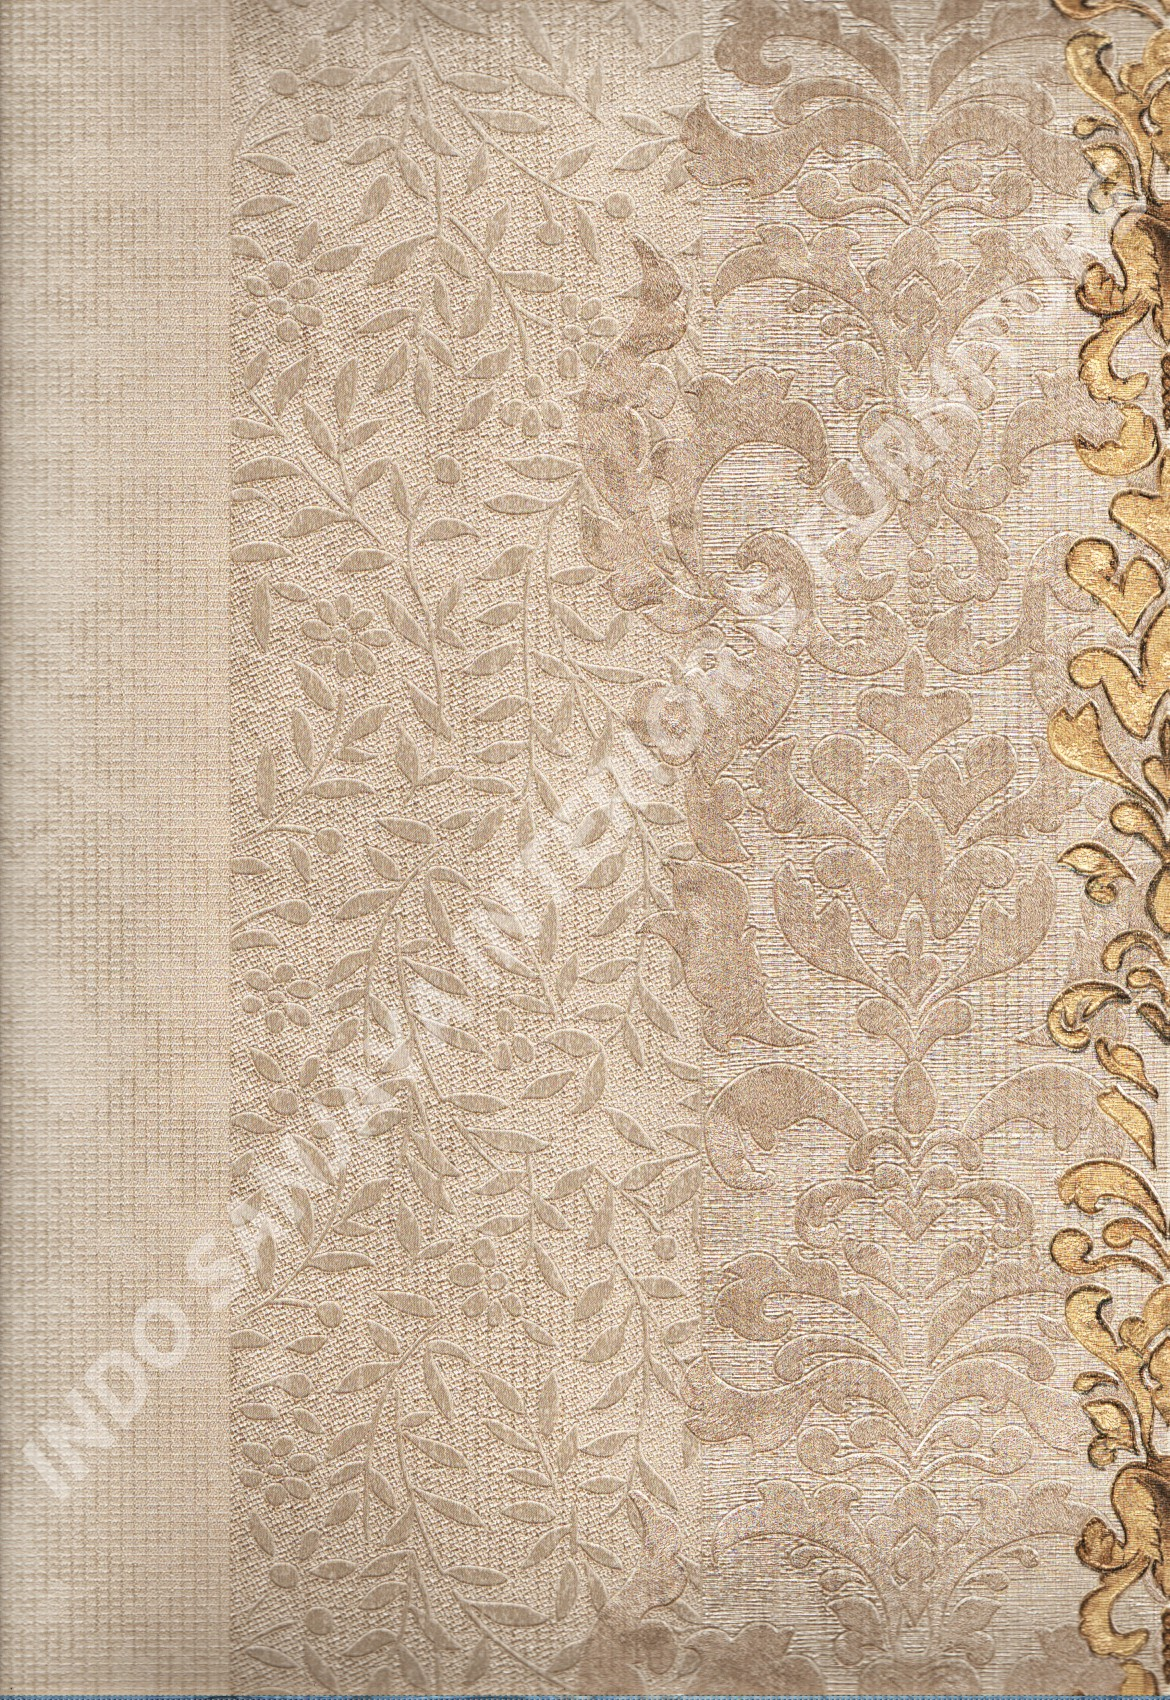 wallpaper   Wallpaper Klasik Batik (Damask) DL11902:DL11902 corak  warna